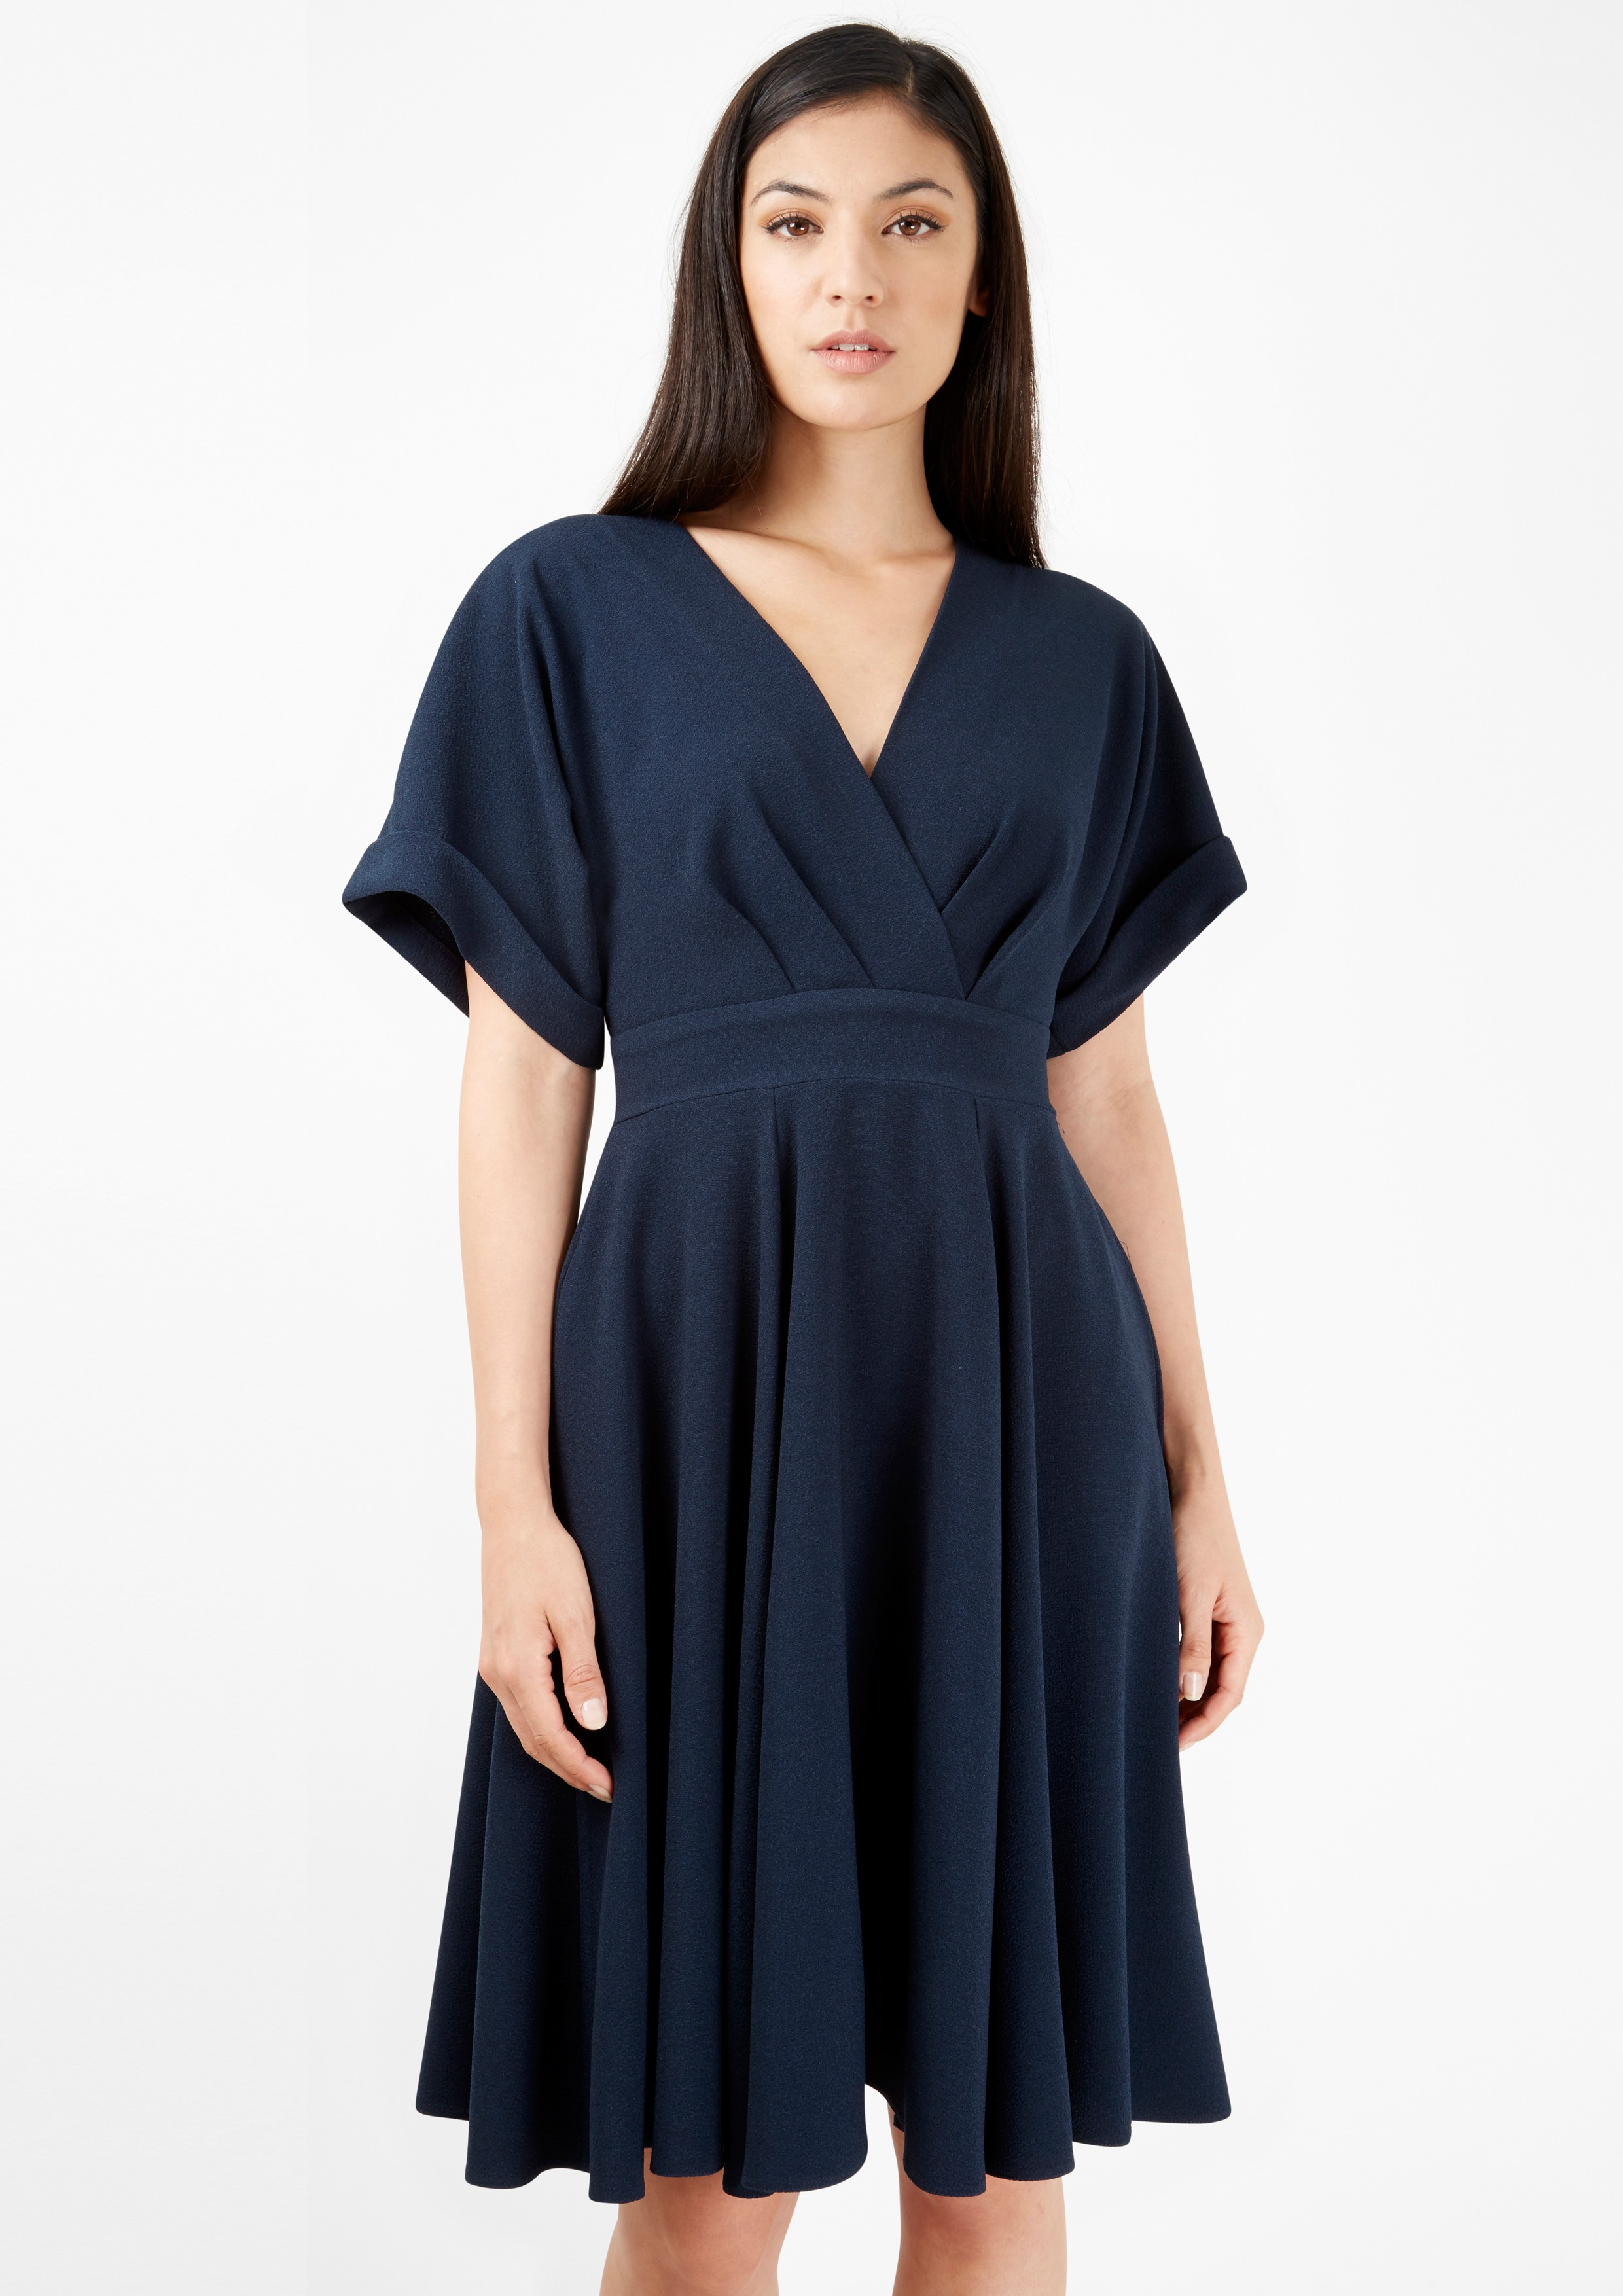 A Flared Dress